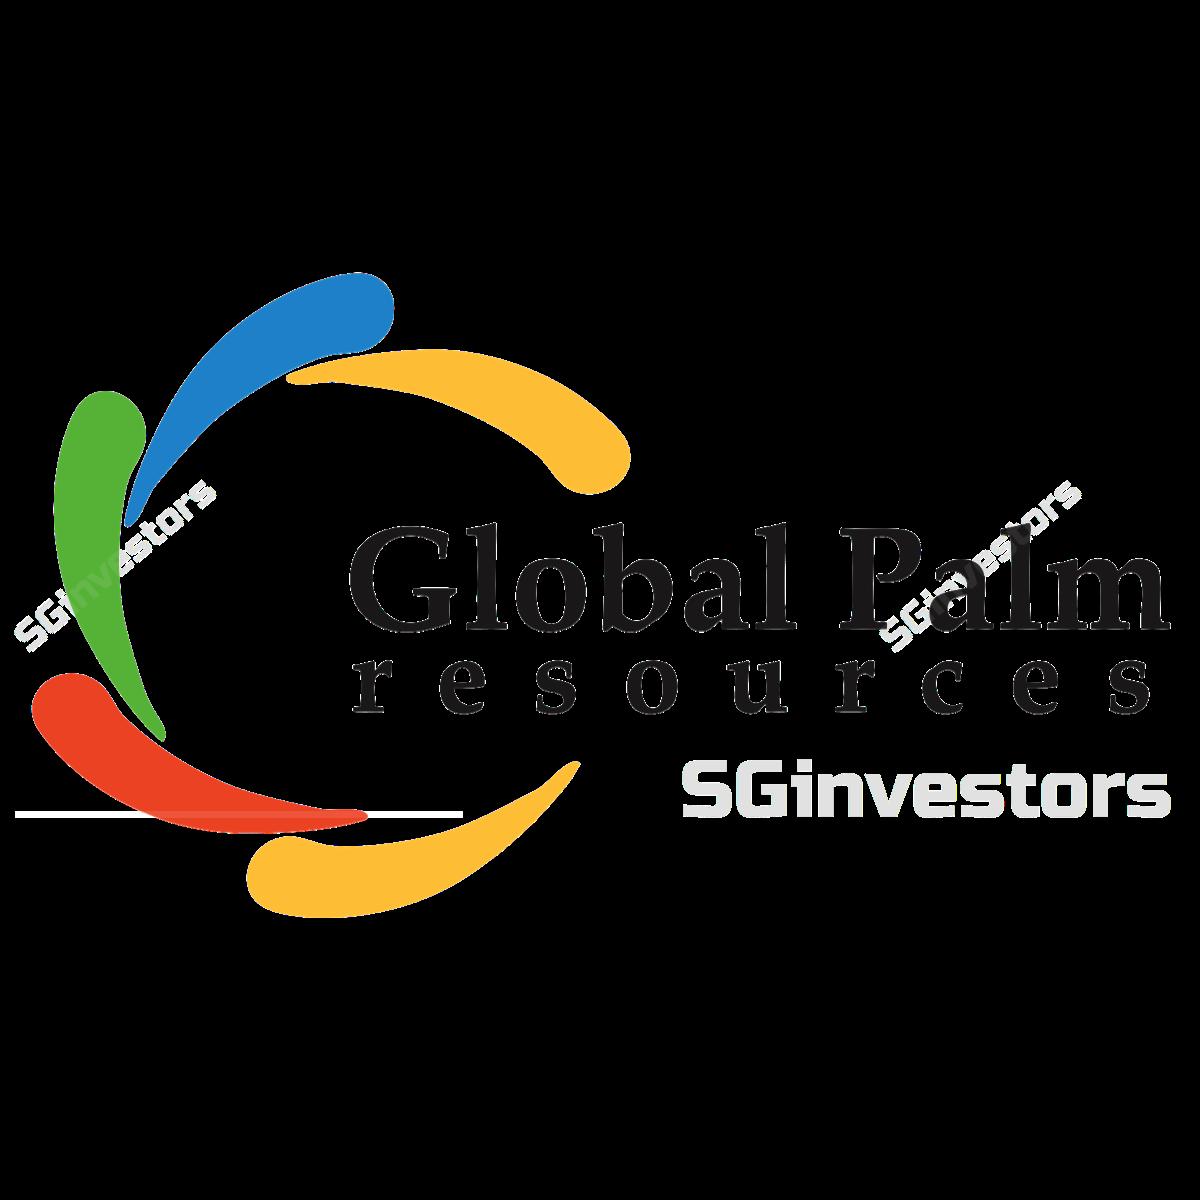 GLOBAL PALM RESOURCES HLGS LTD (SGX:BLW) @ SGinvestors.io